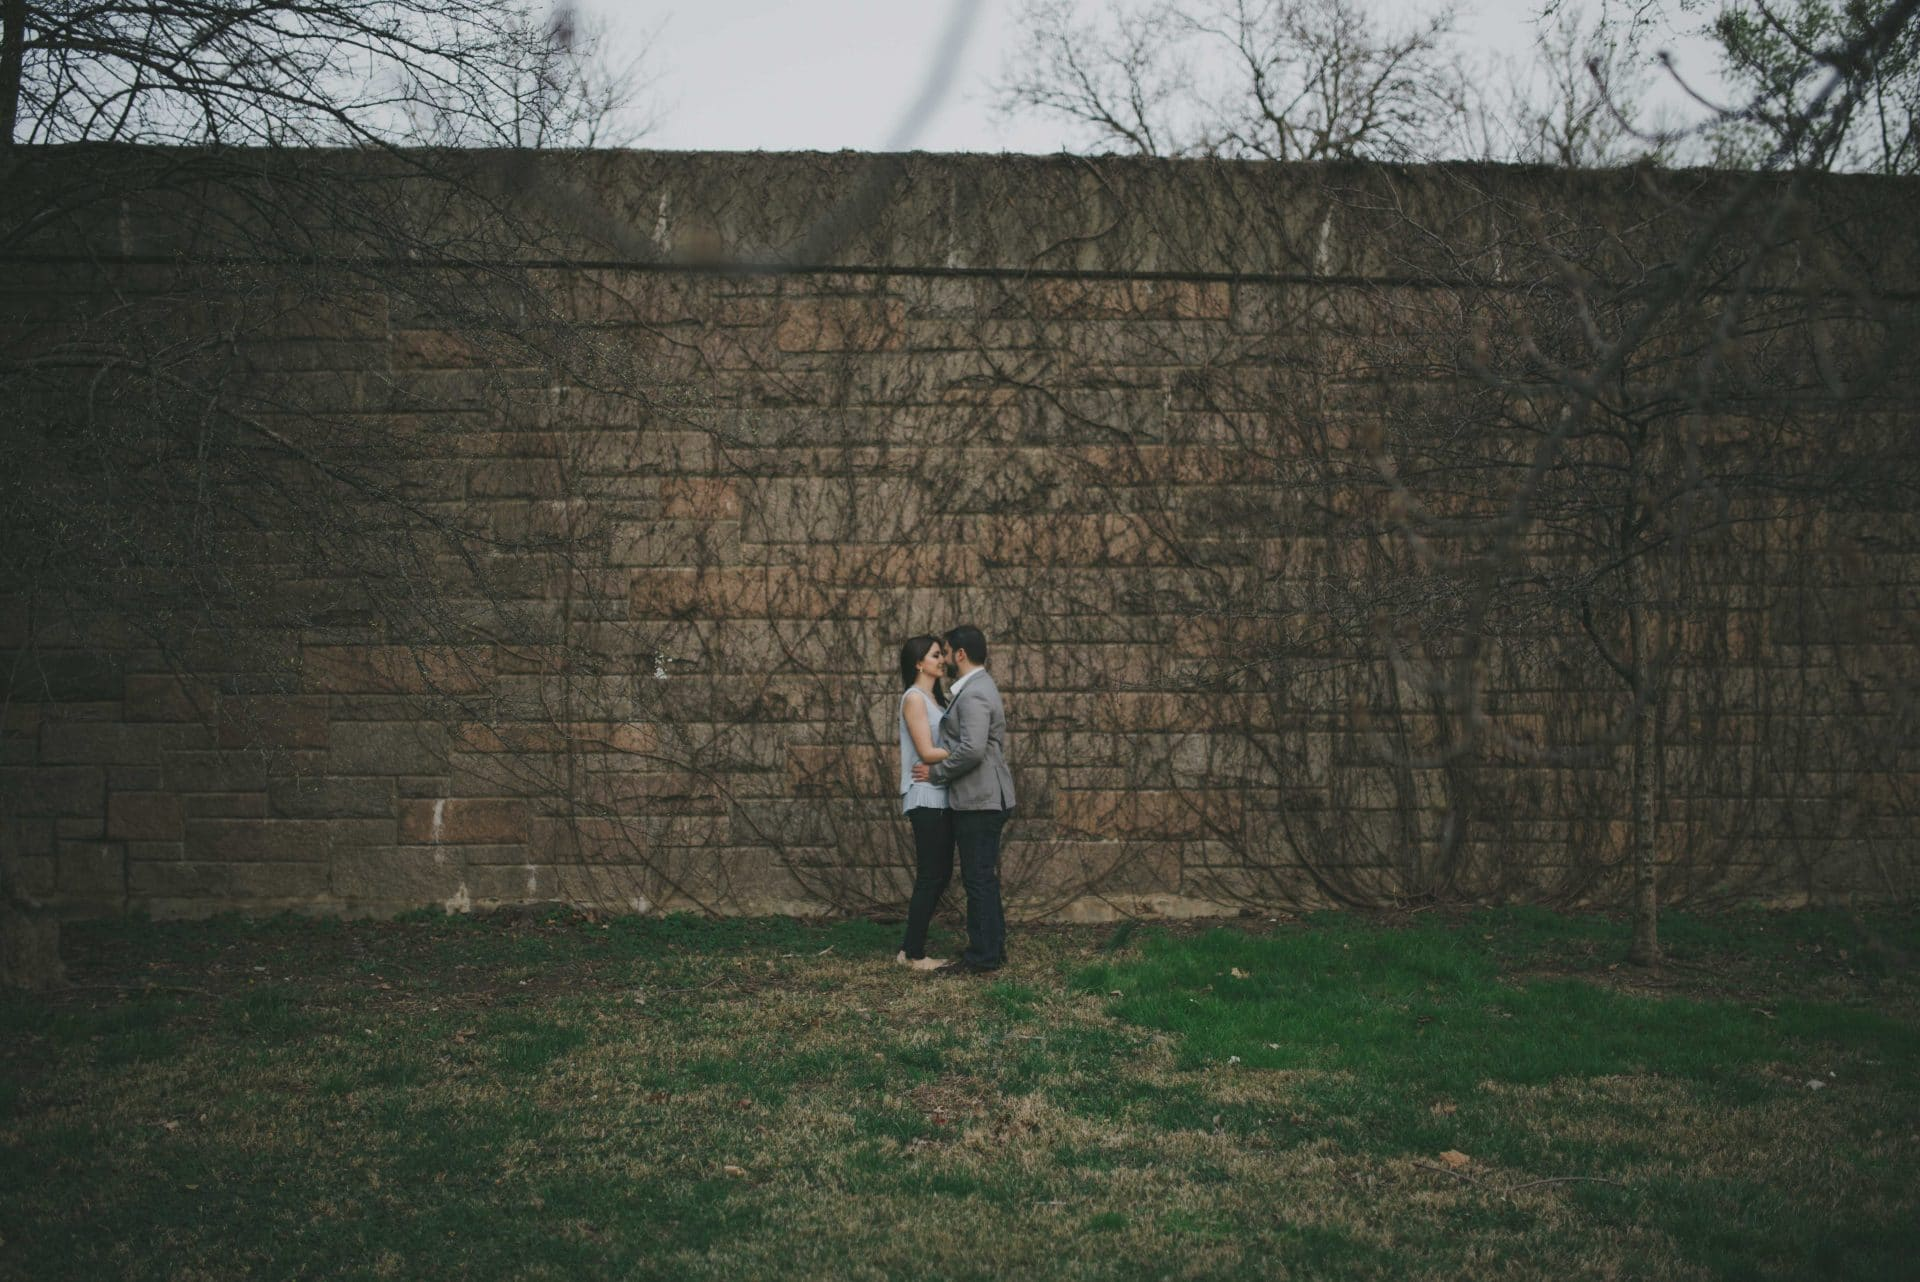 Jefferson Memorial -Spring - Engagement Session